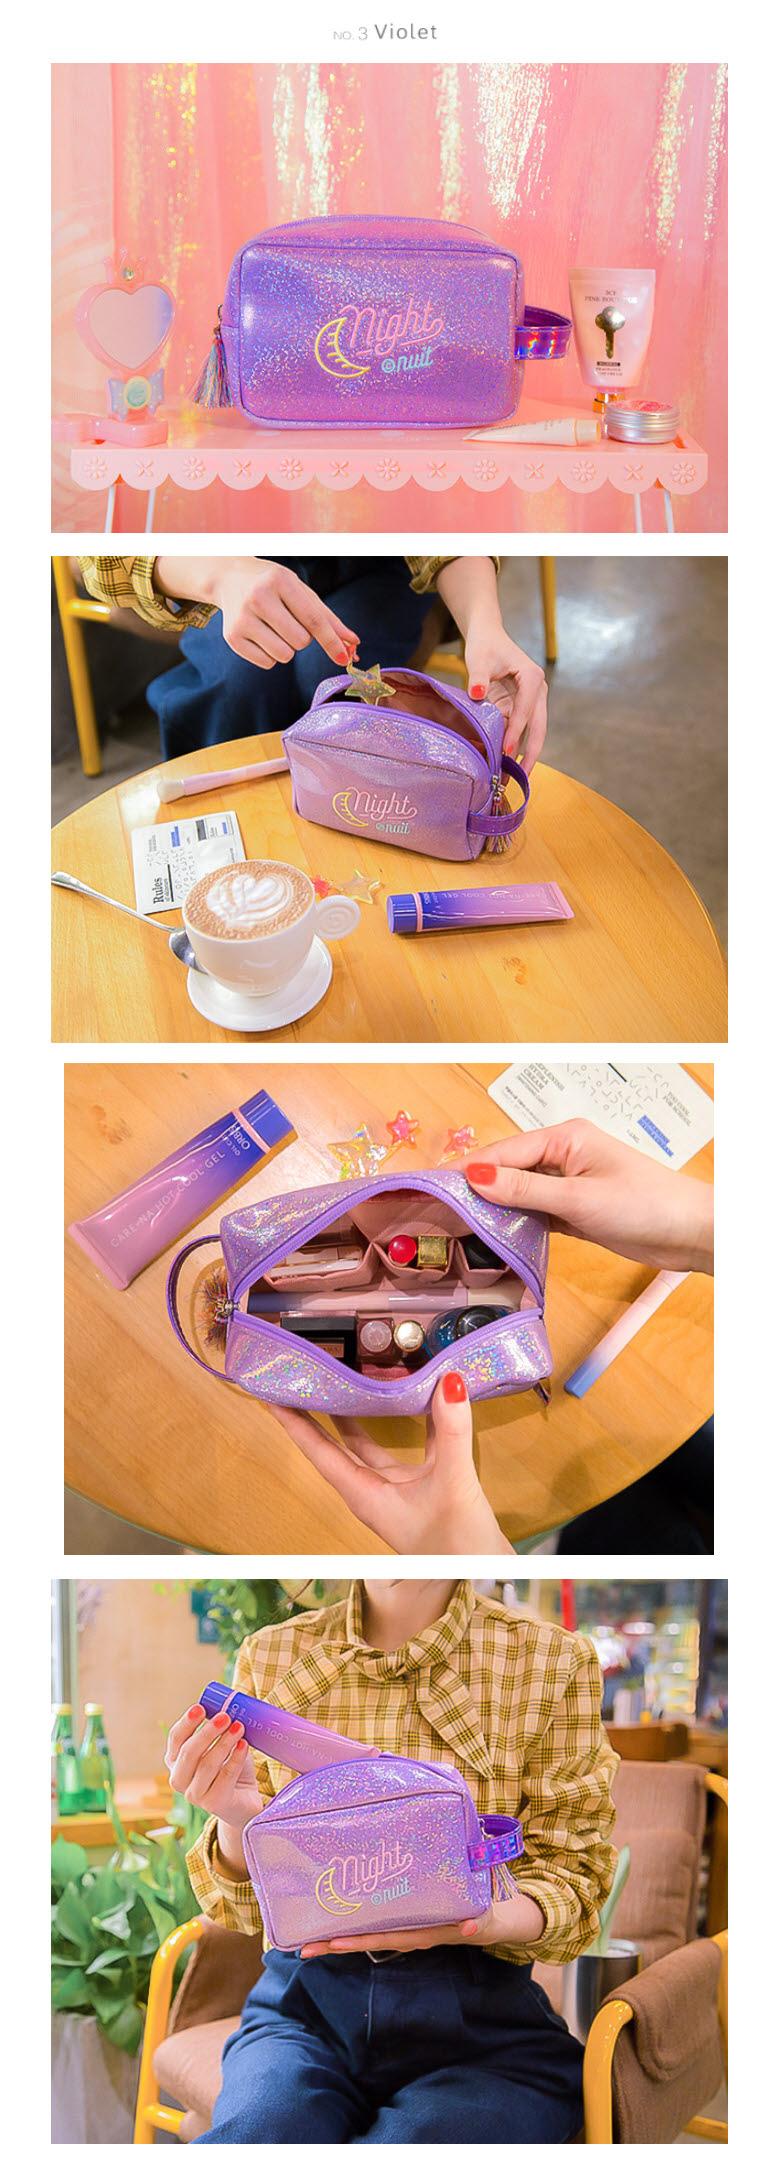 BENTOY 문나이트 화장품파우치 - 251w, 8,410원, 메이크업 파우치, 지퍼형